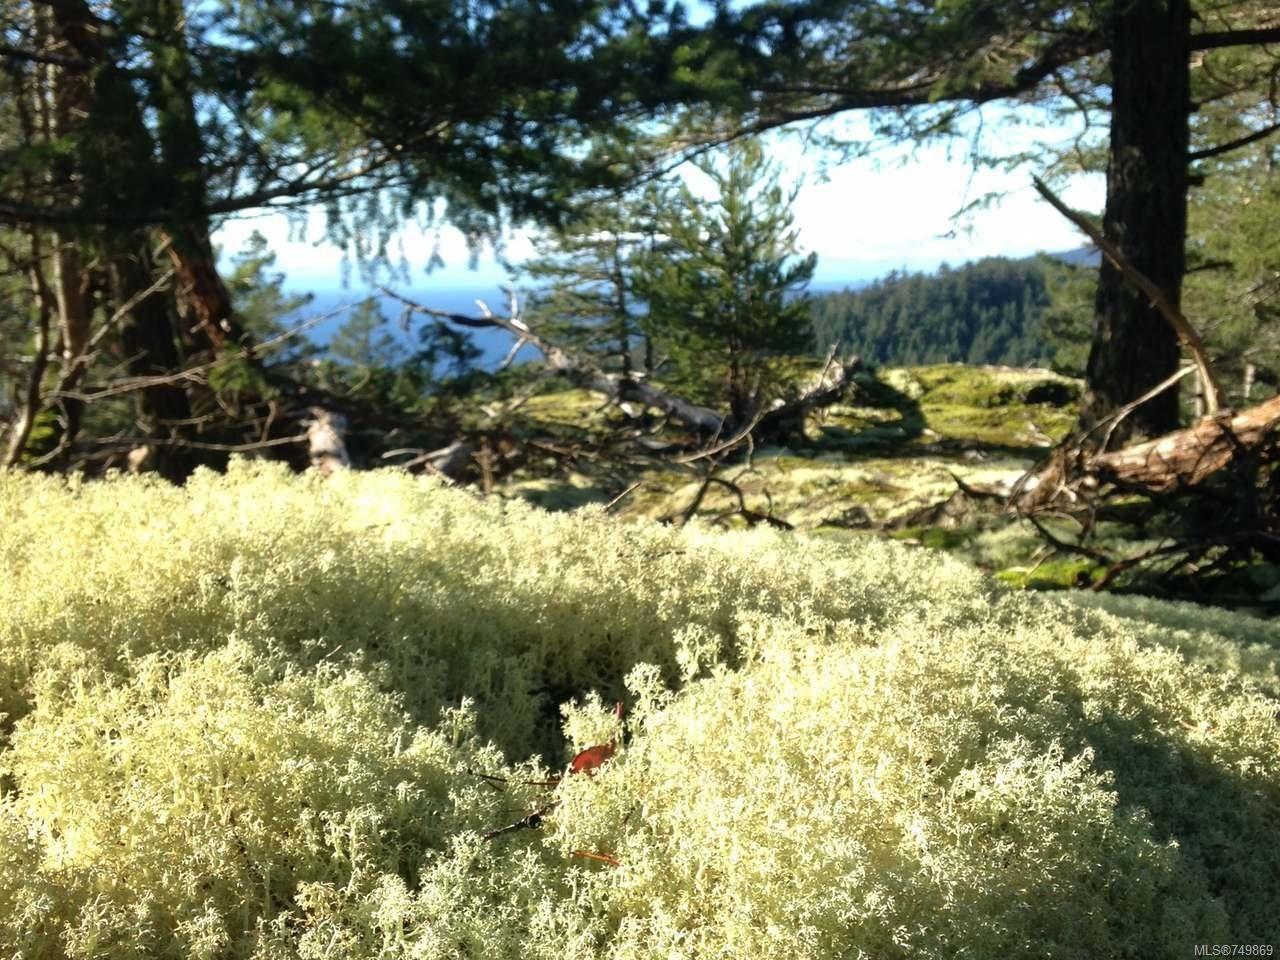 Photo 19: Photos: LT 2 Lakota Rd in LASQUETI ISLAND: Isl Lasqueti Island Land for sale (Islands)  : MLS®# 749869